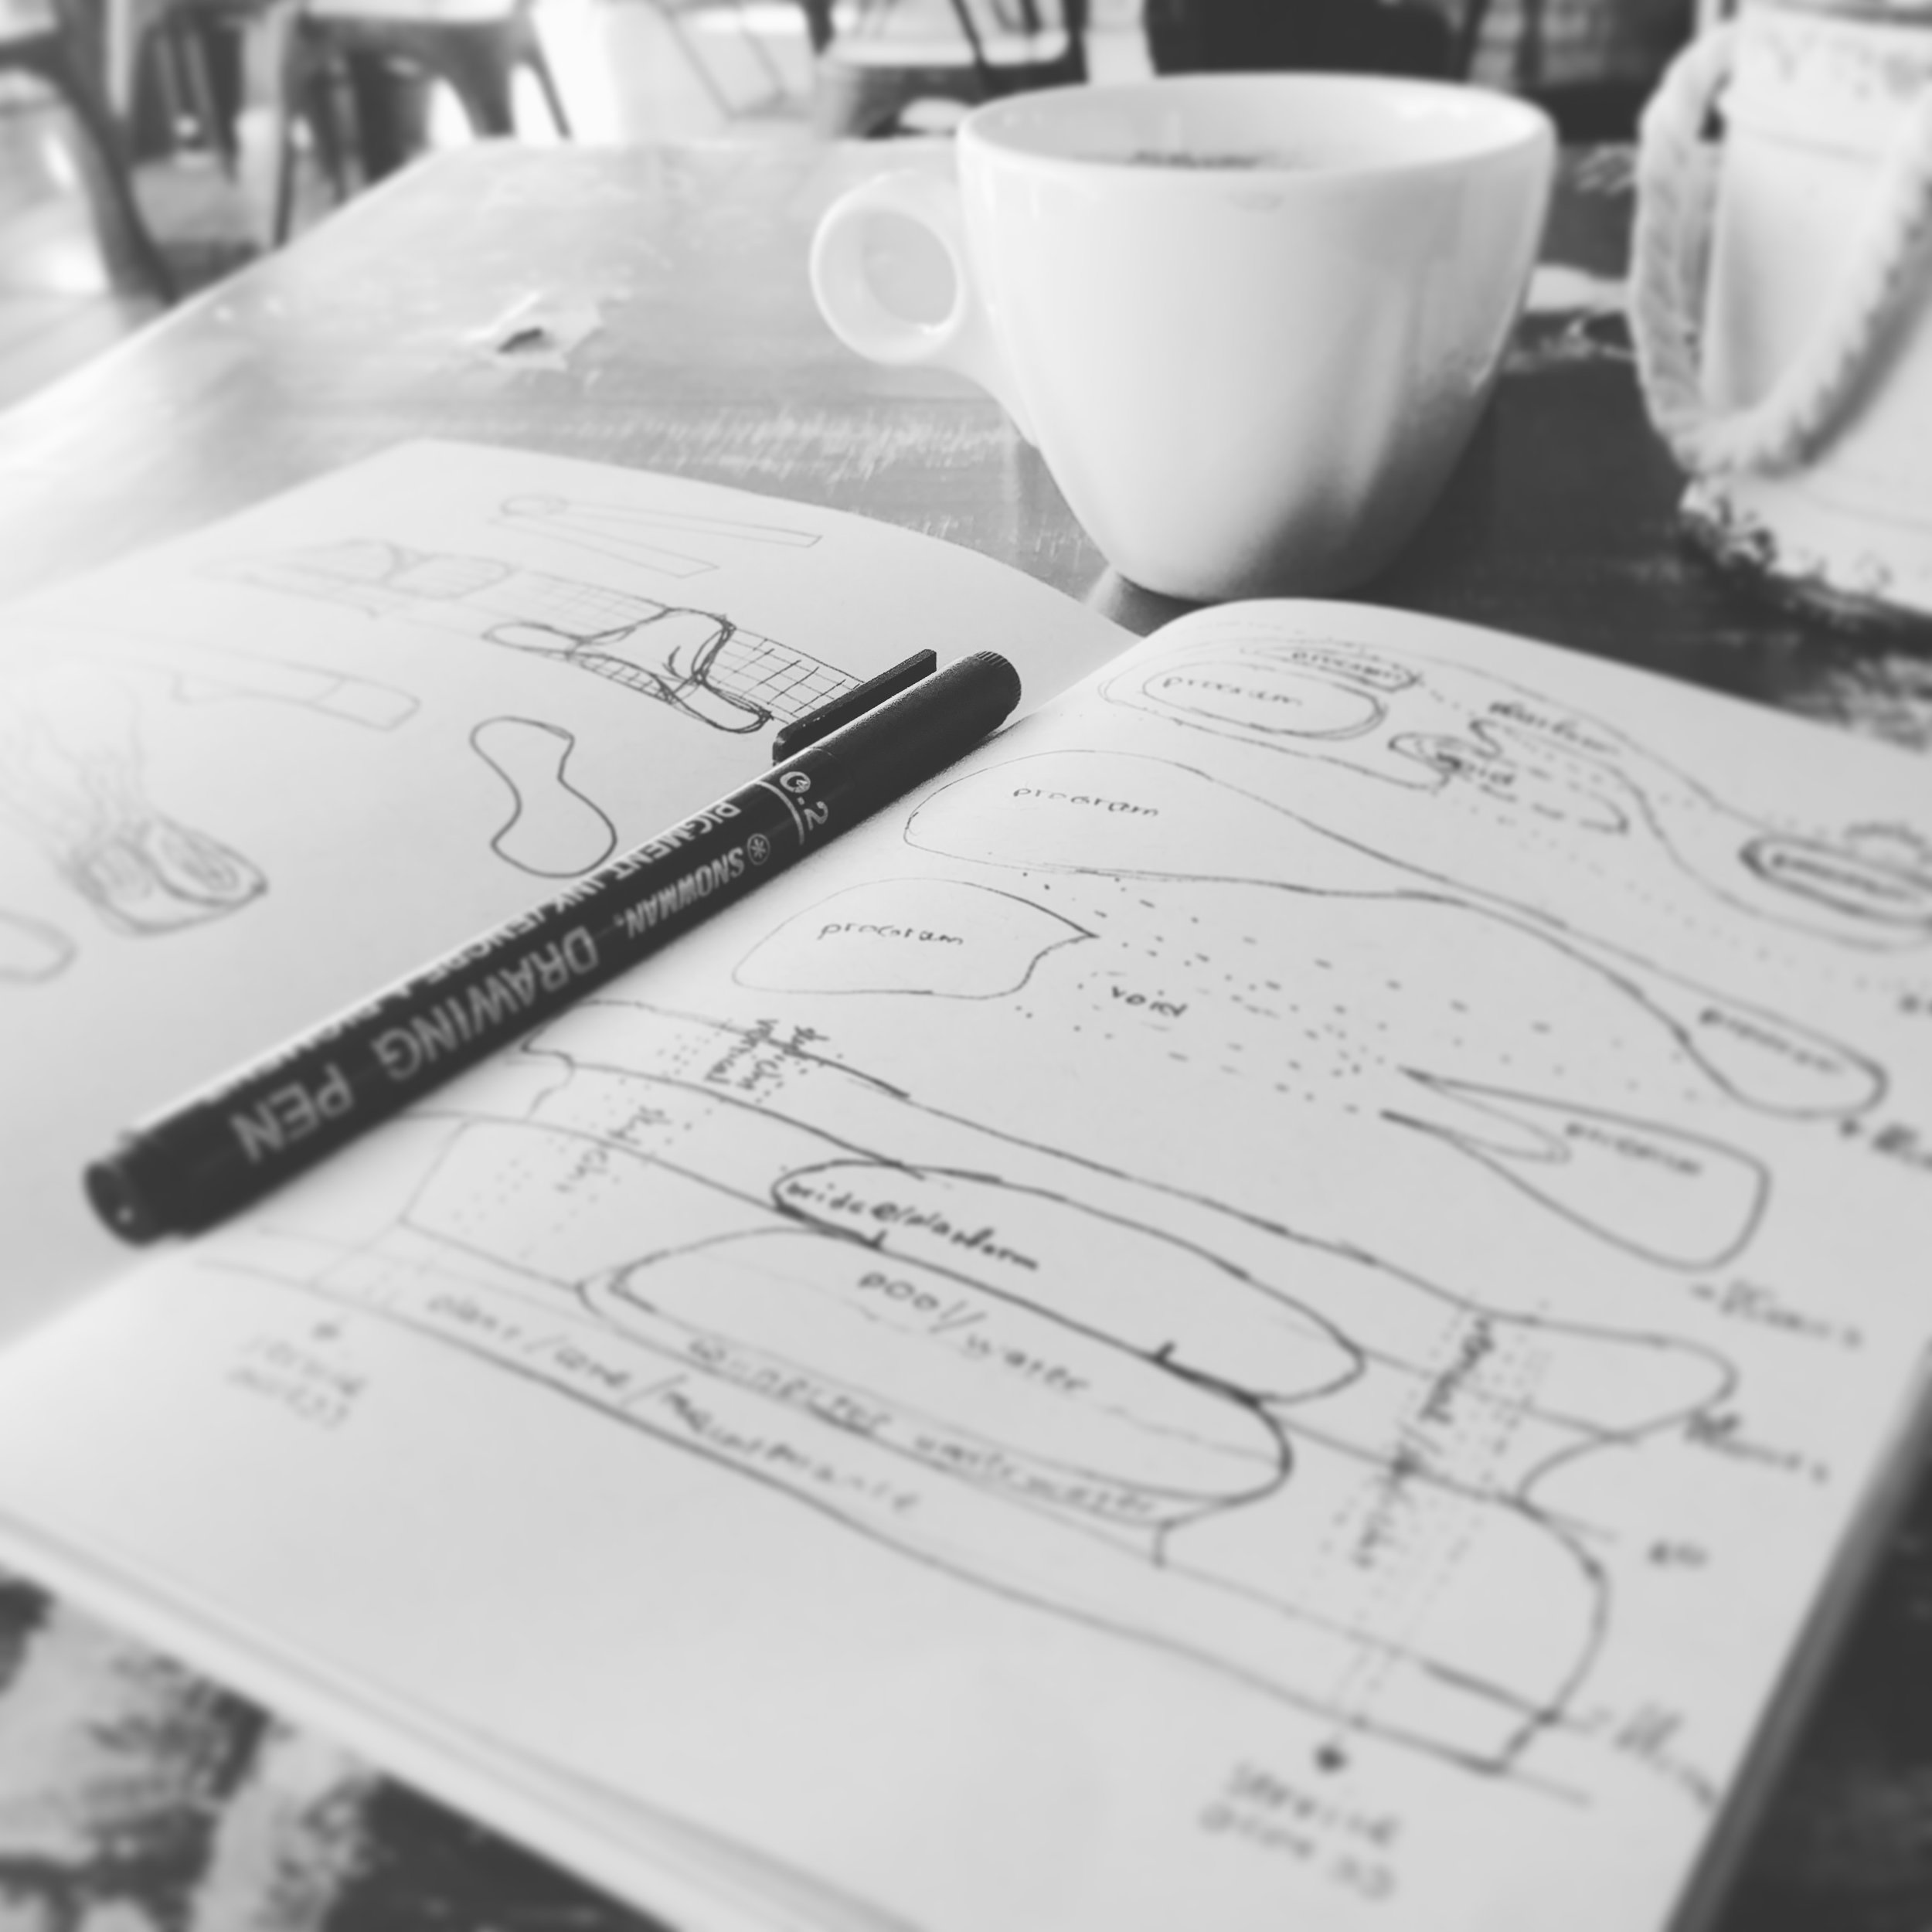 IDEABAR studio | architecture sketchbook